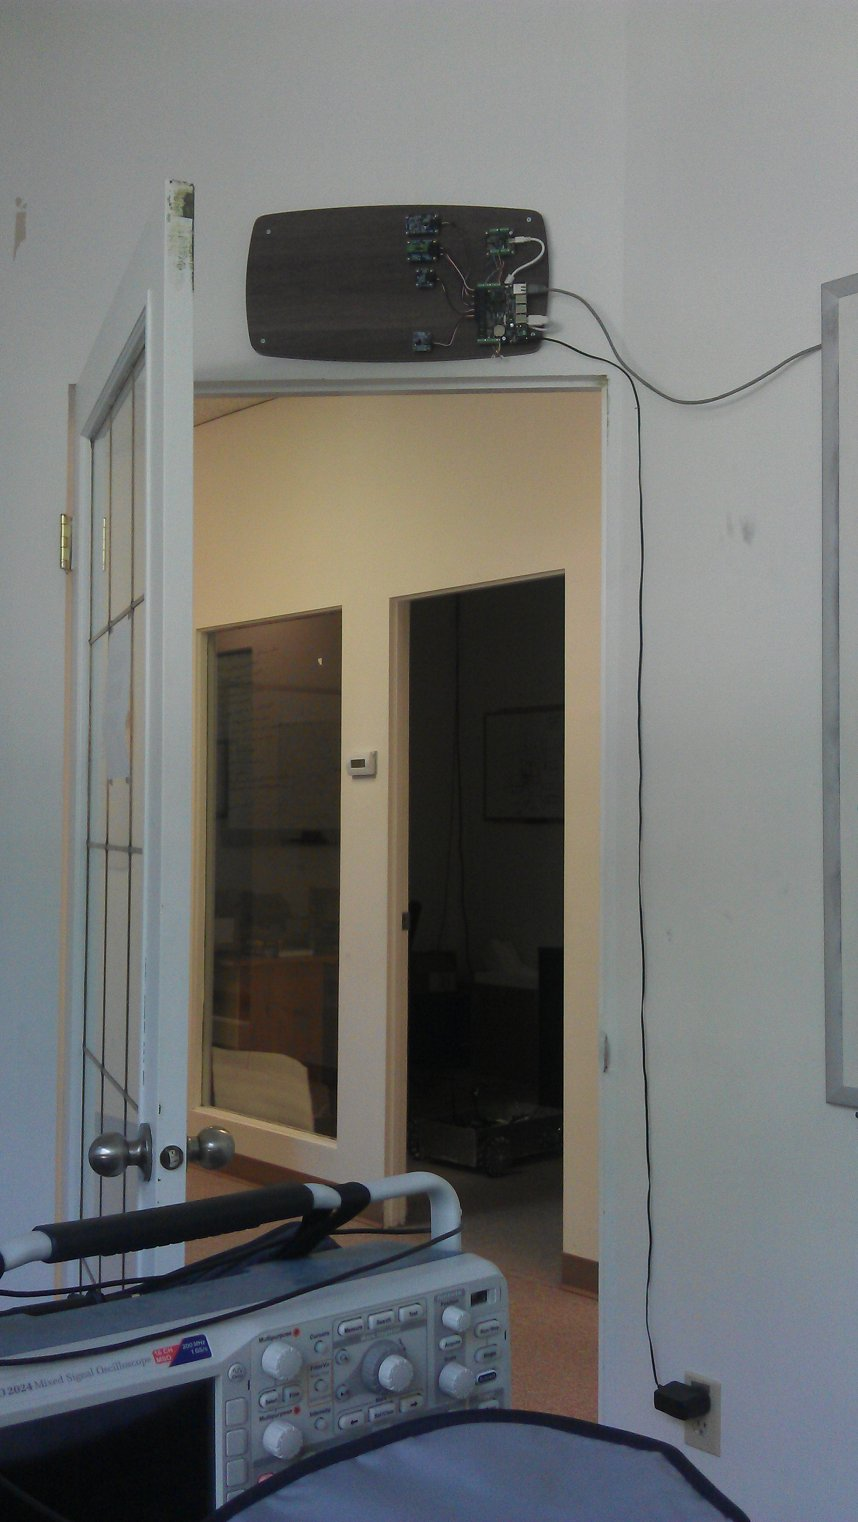 The Phidget home automation sensor panel mounted.